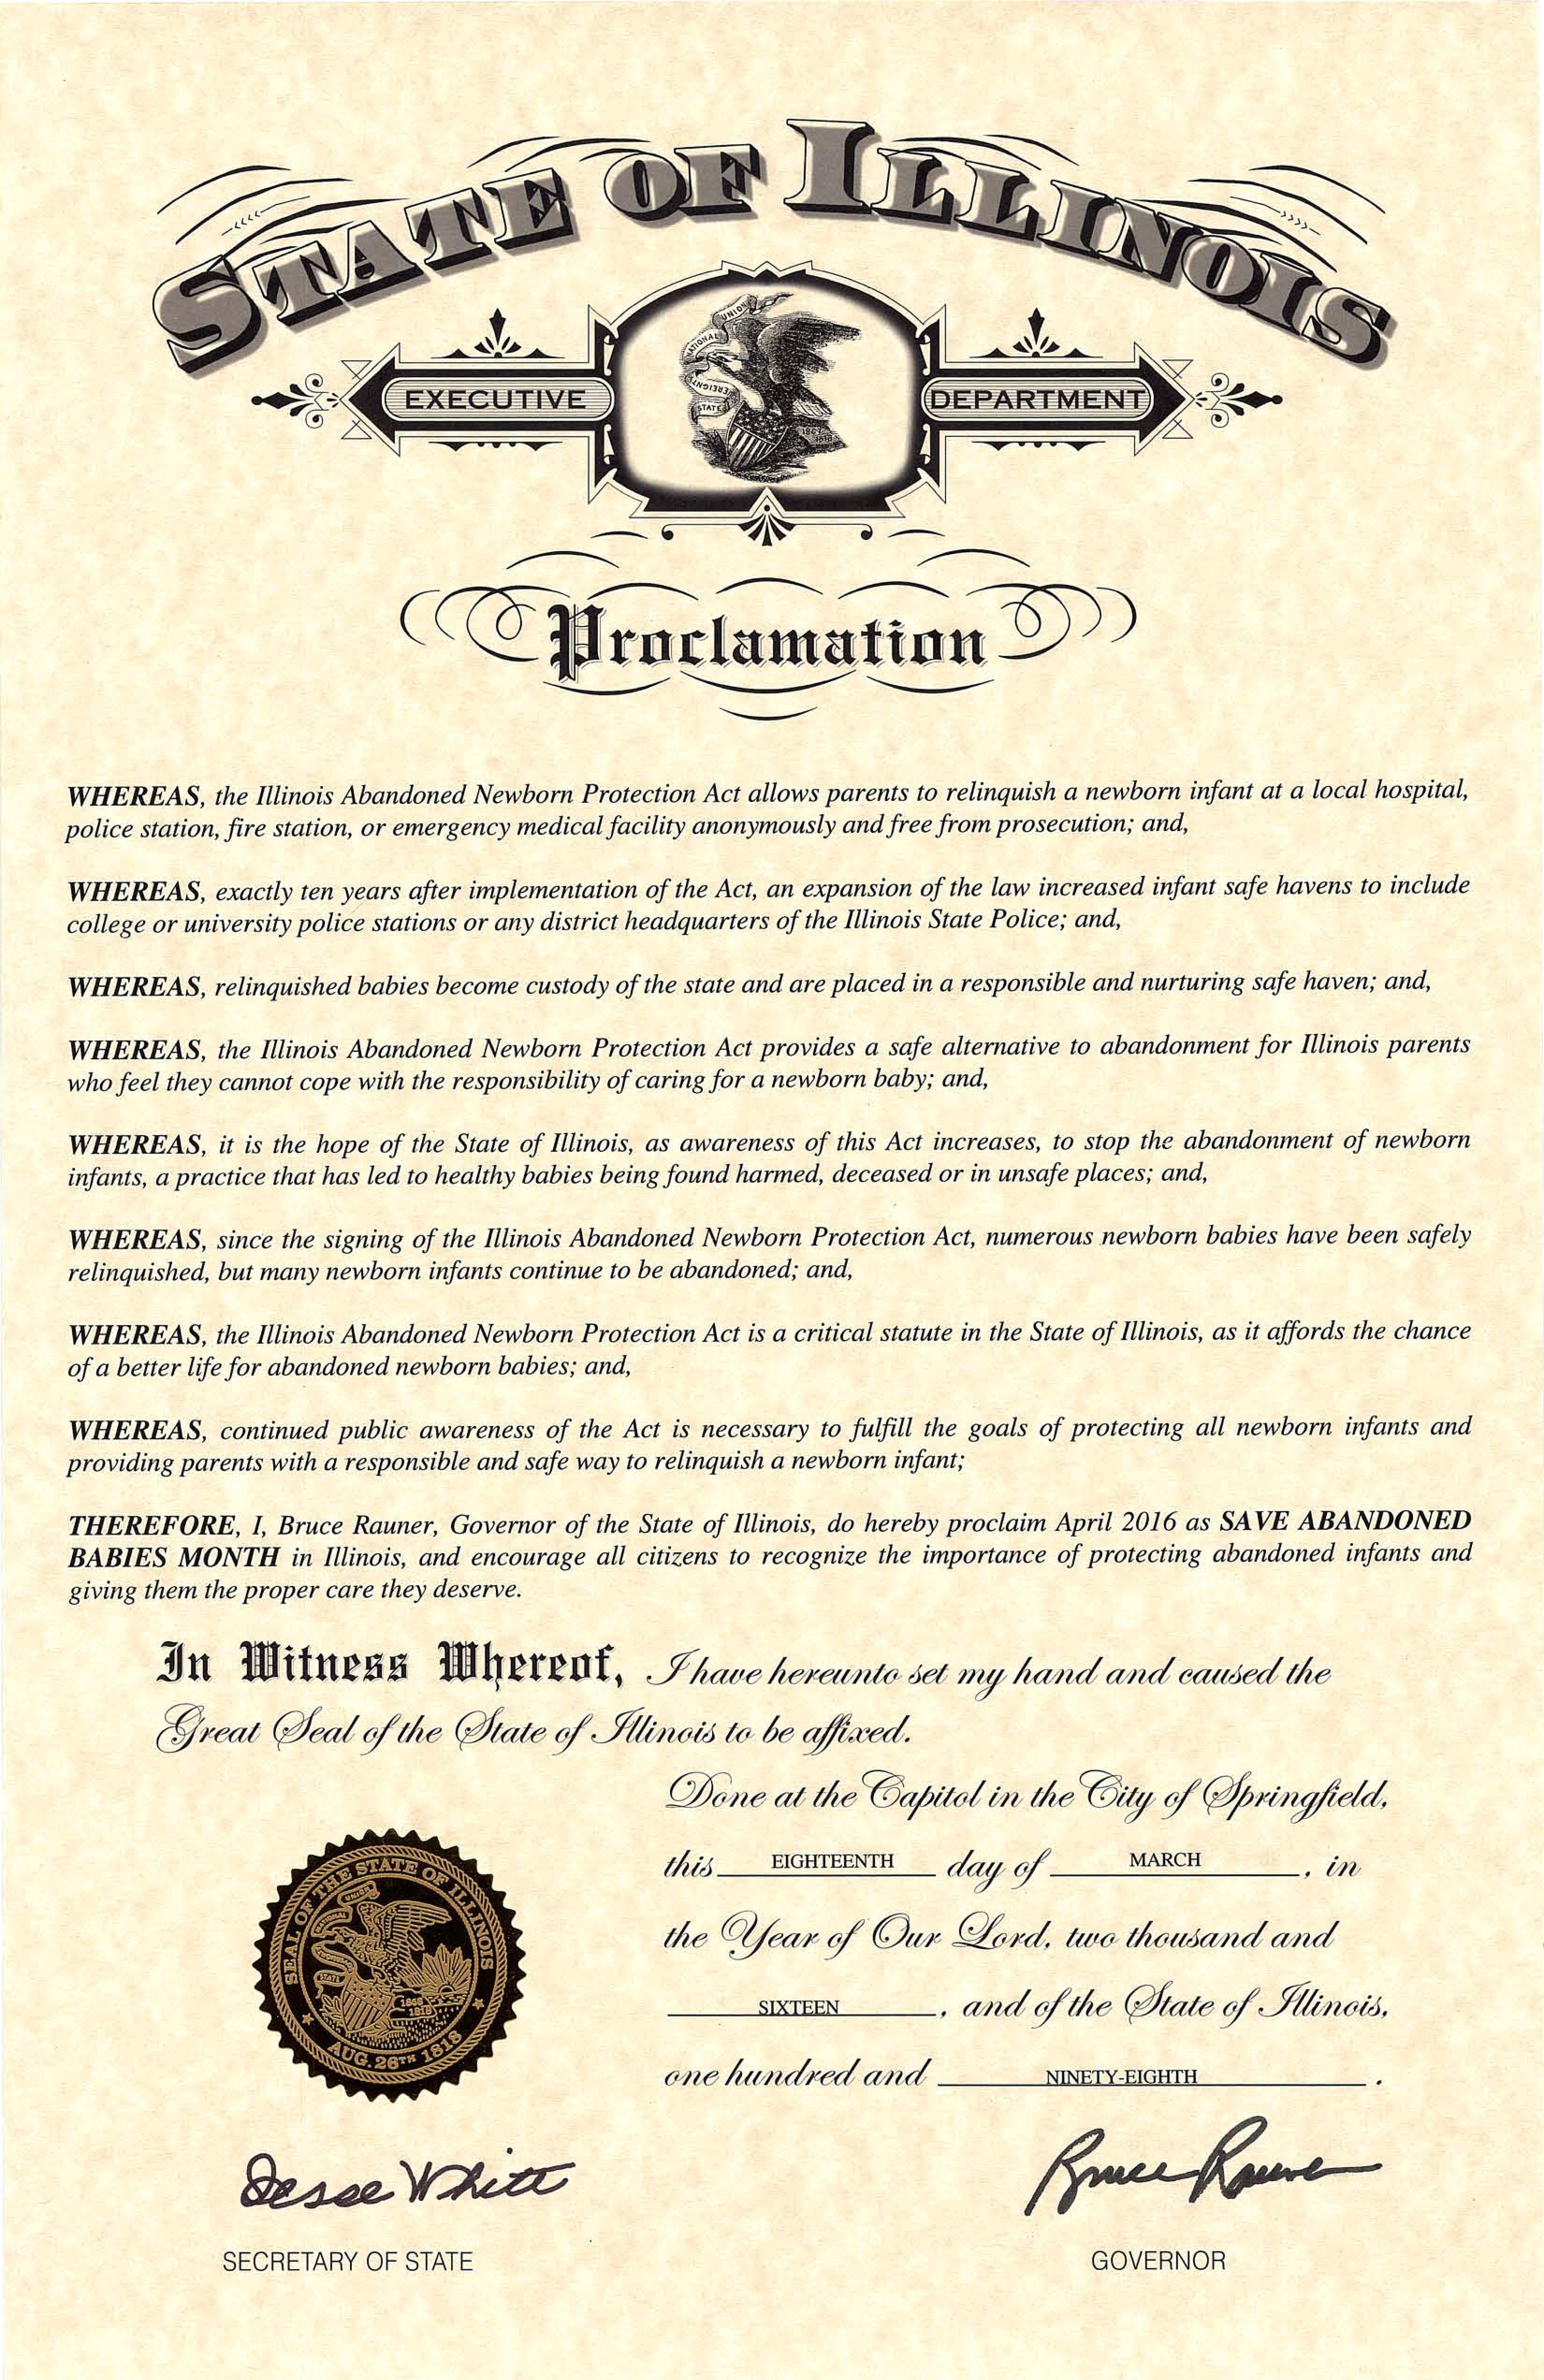 2016 Gov. Proclamation